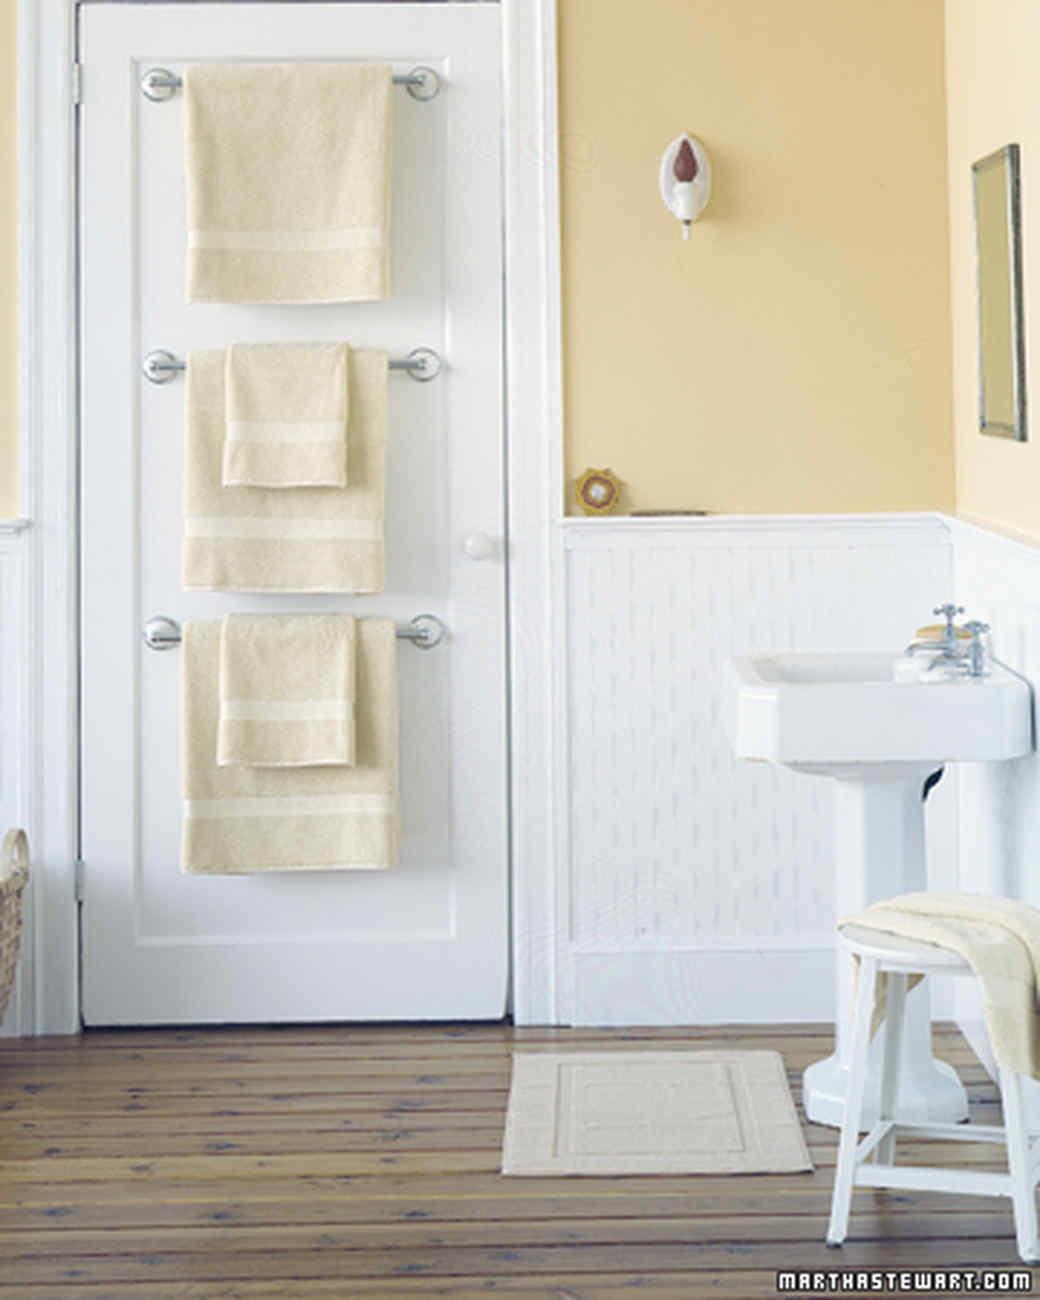 Pleasing Towel Bar Trio Bathroom Organizers Martha Stewart Bathroom Shelving Solutions bathroom Bathroom Shelving Solutions